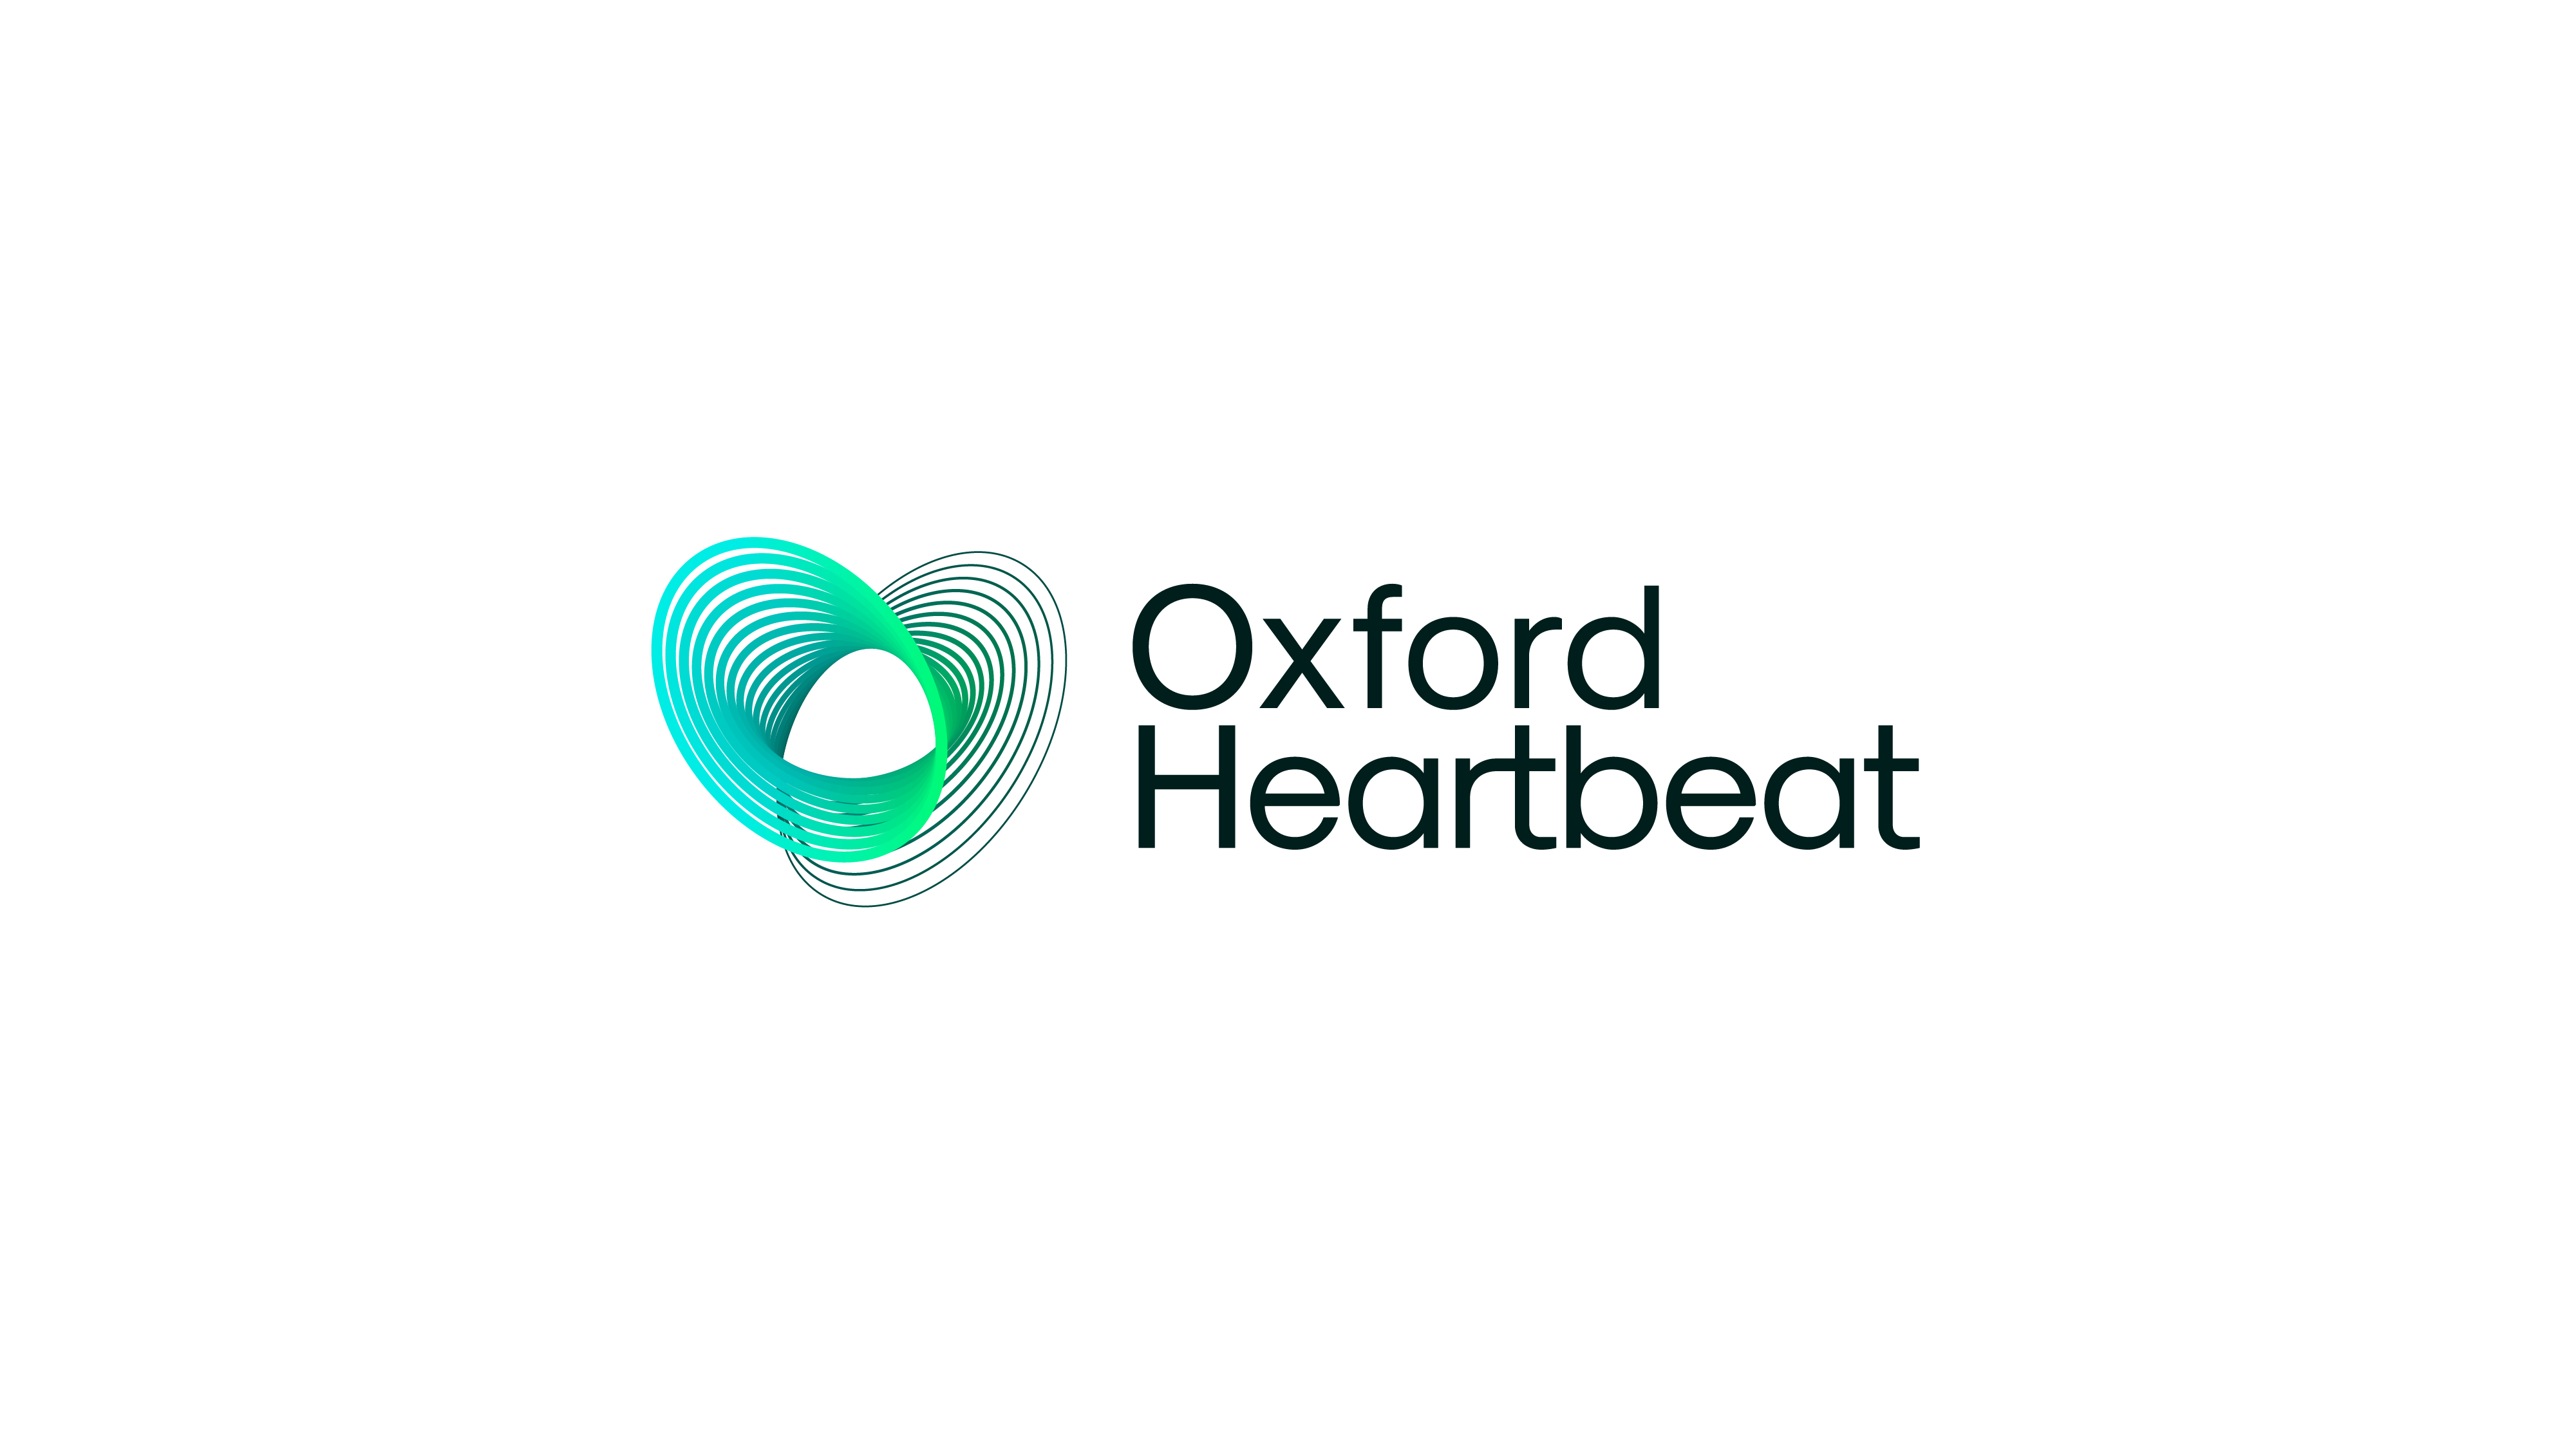 50_logos_4_heart_logo_design_brandforma